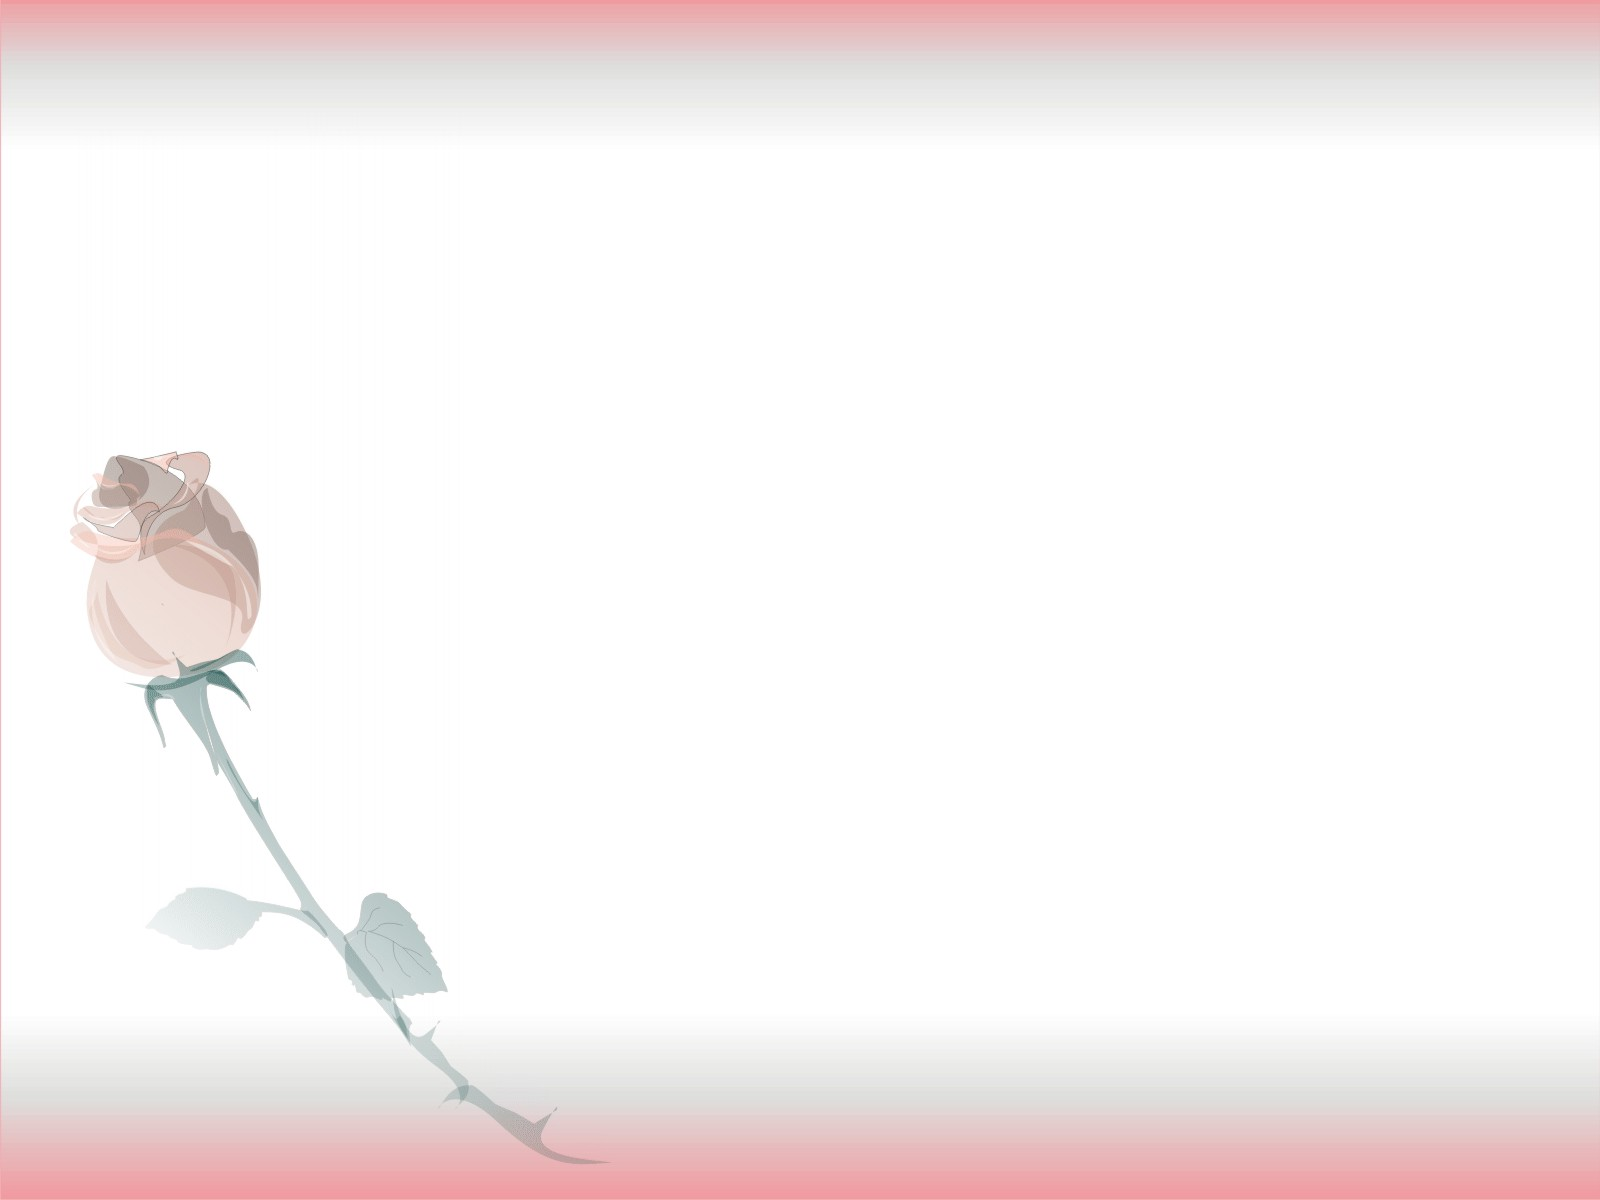 http://3.bp.blogspot.com/-534-WHlVXnY/UEoYkAj9t7I/AAAAAAAASKI/Su5Oc7bFAZQ/s1600/Flowers+background+desktop+wallpapers..jpg